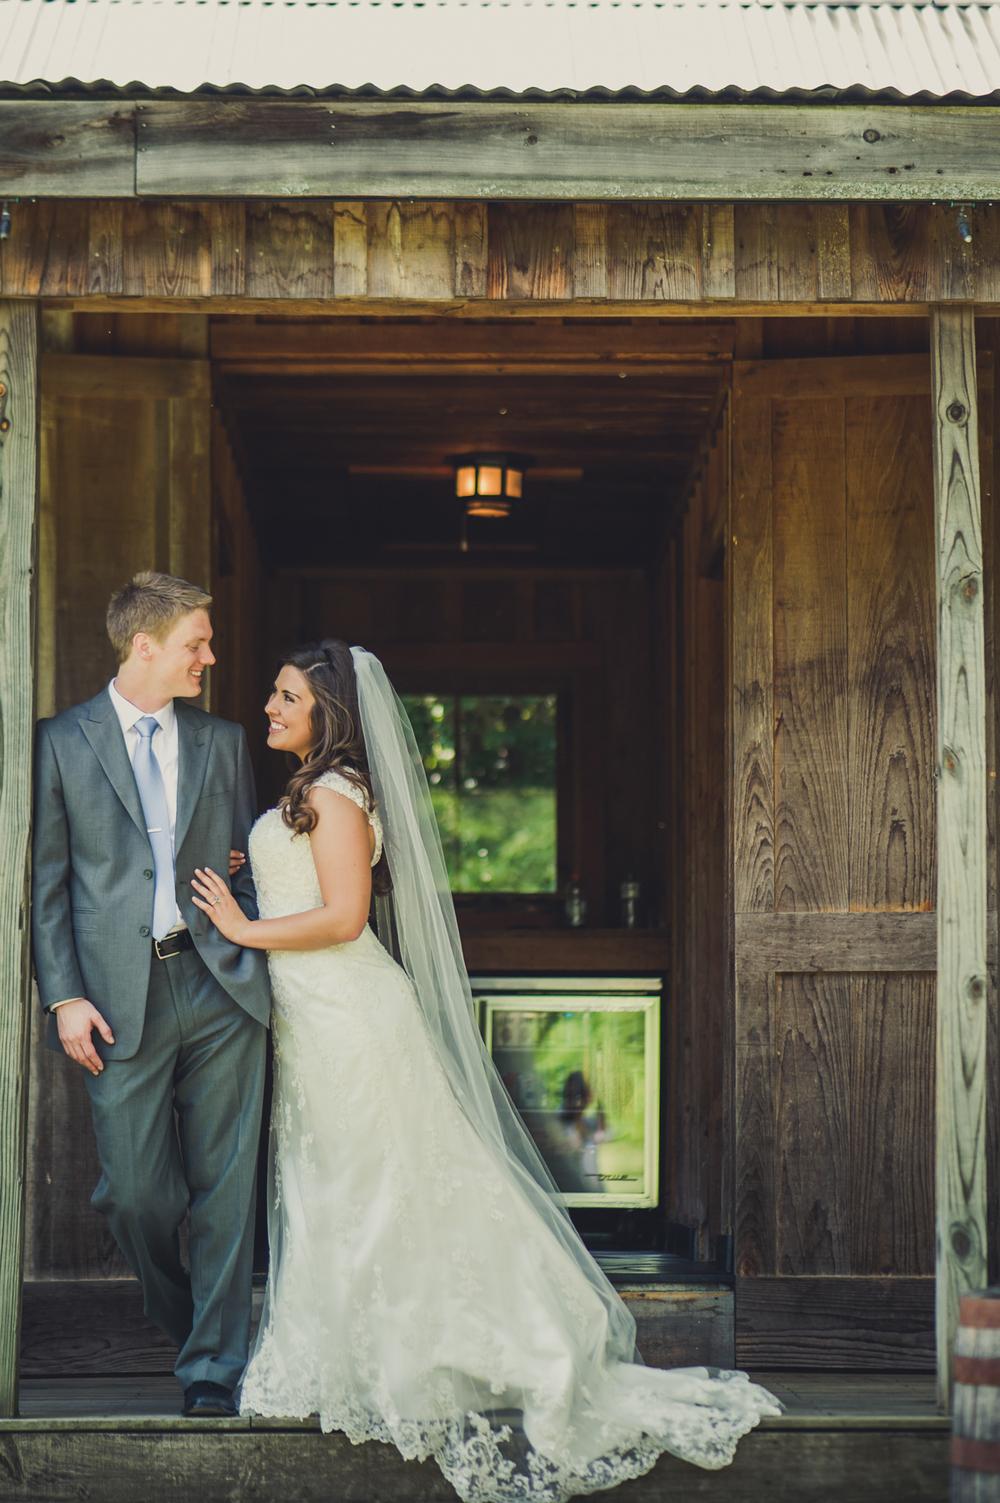 creationstudios-memphis-wedding-photography-0027-paigestephenbridegroomfull-059-DSC_3820.jpg